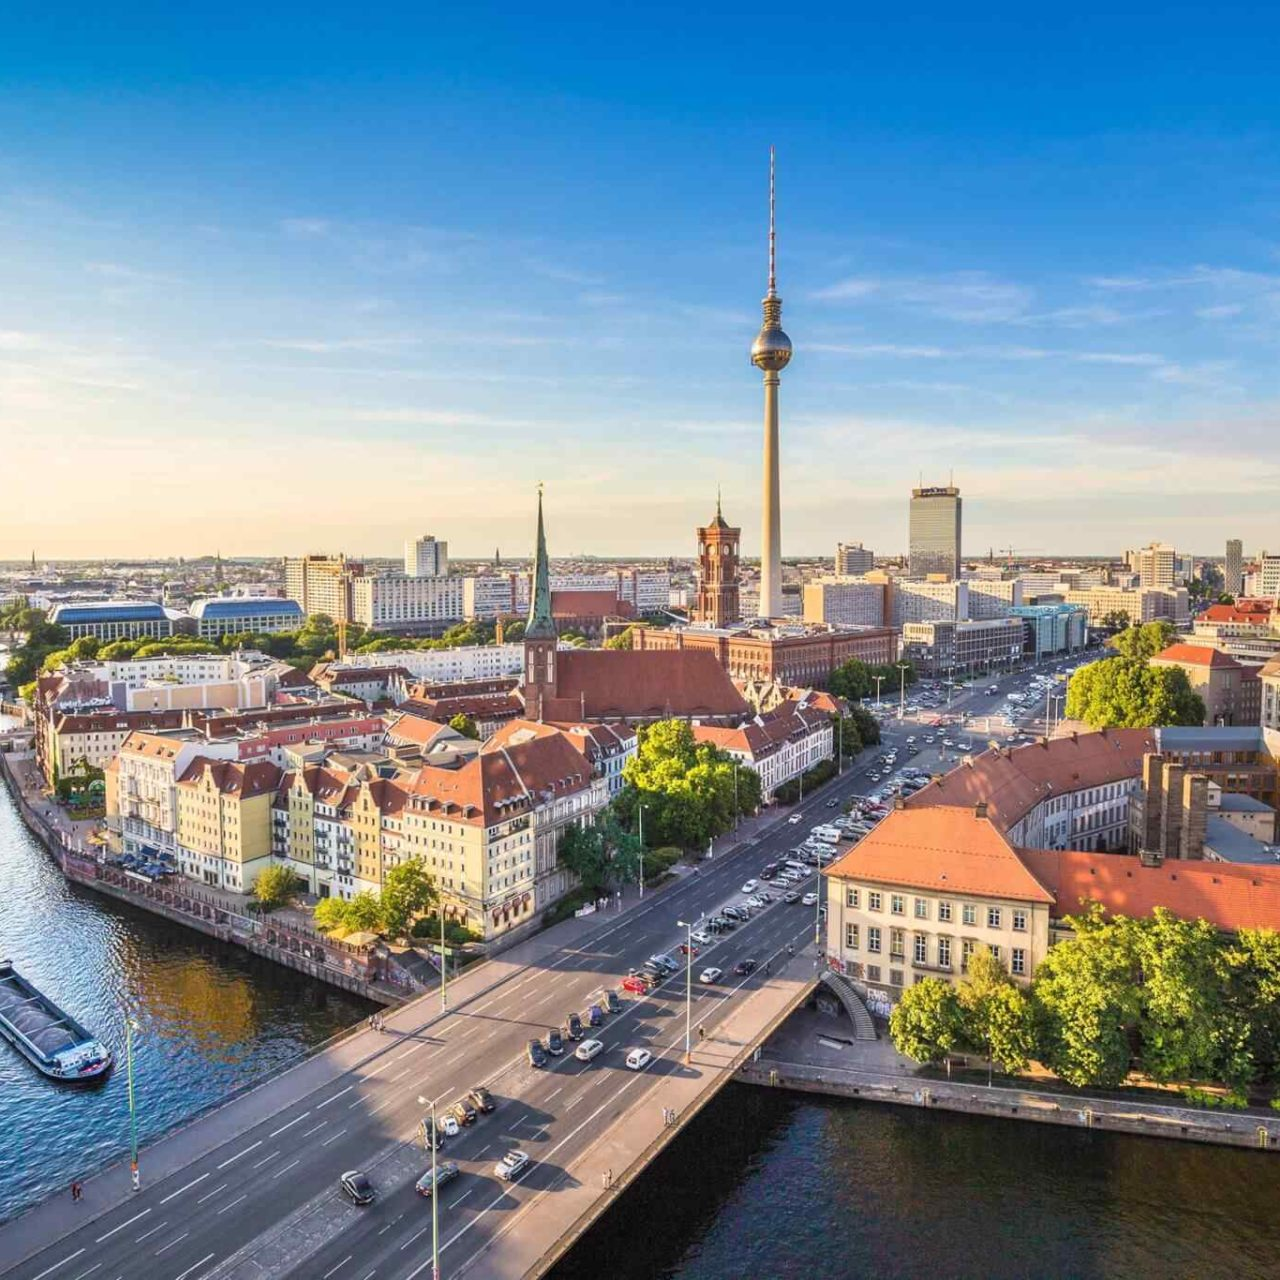 https://www.banitours.com/wp-content/uploads/2018/09/destination-berlin-05-1280x1280.jpg